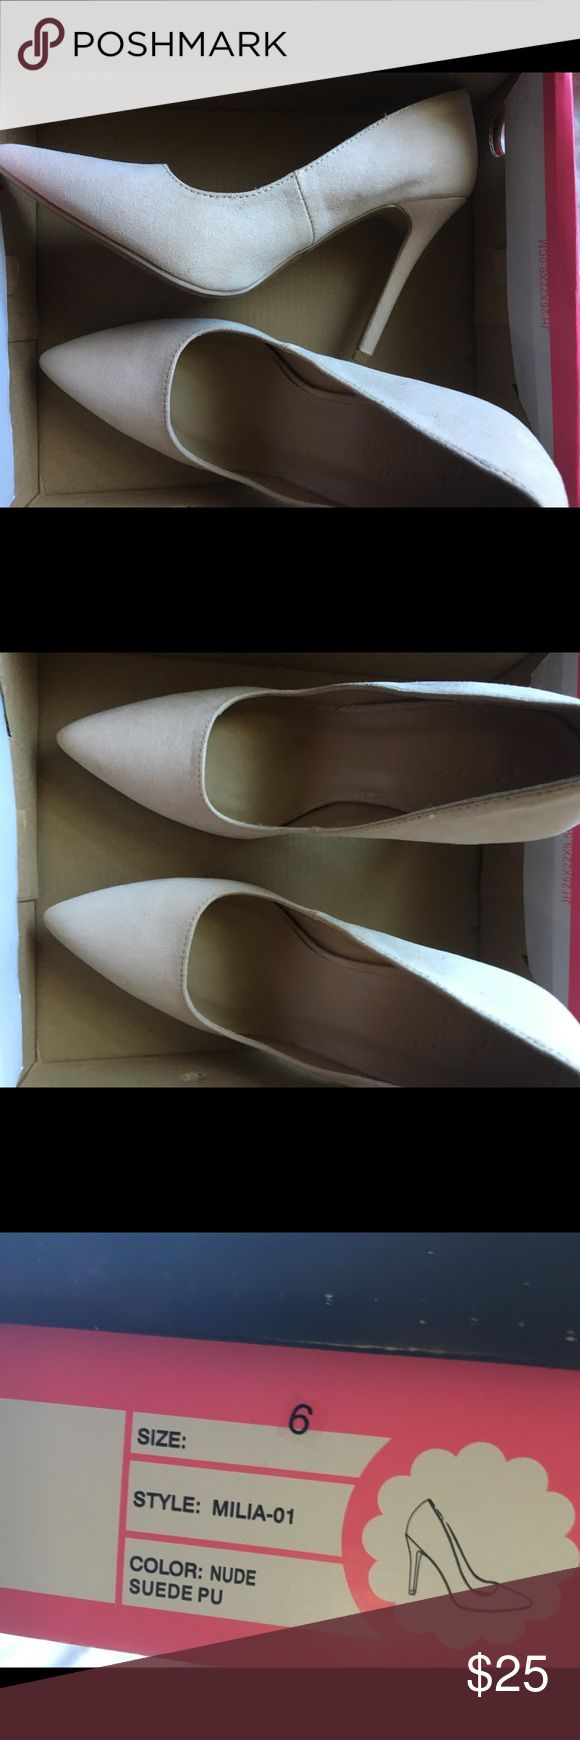 Charlotte Russe heels Nude size 6 Charlotte Russe heels ! Never worn . Box a little damaged Charlotte Russe Shoes Heels